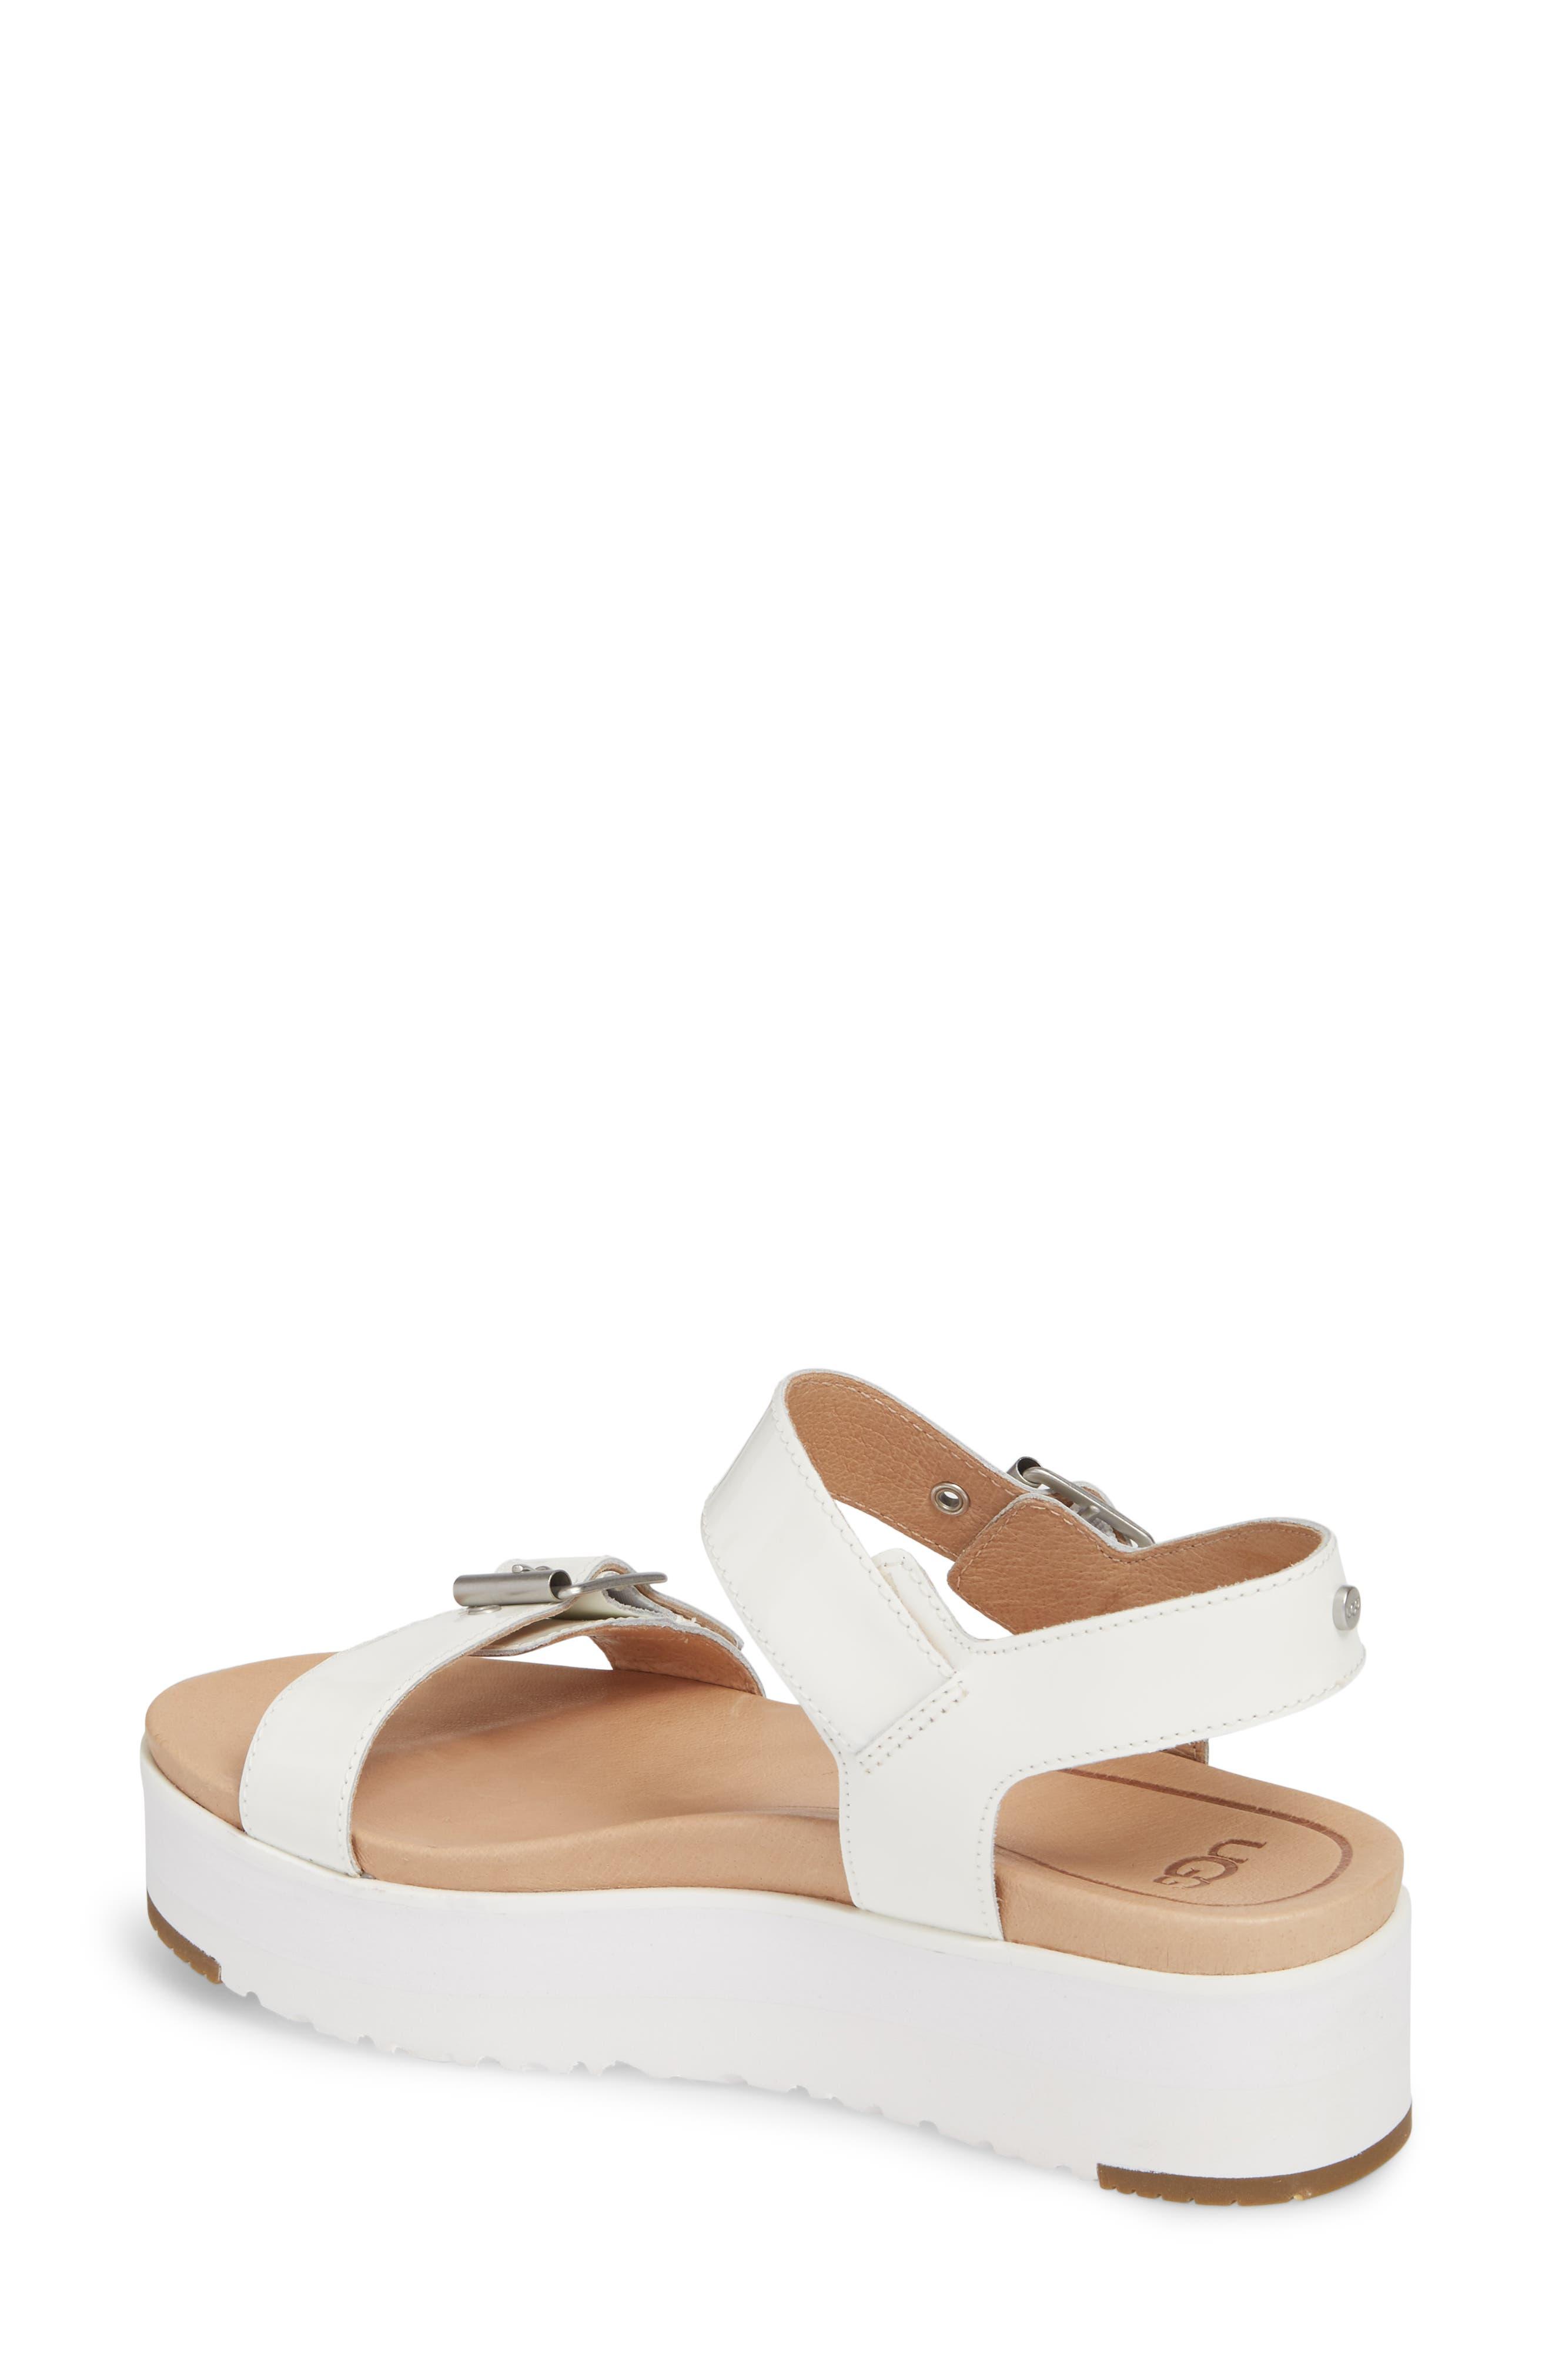 Angie Platform Sandal,                             Alternate thumbnail 2, color,                             White Leather